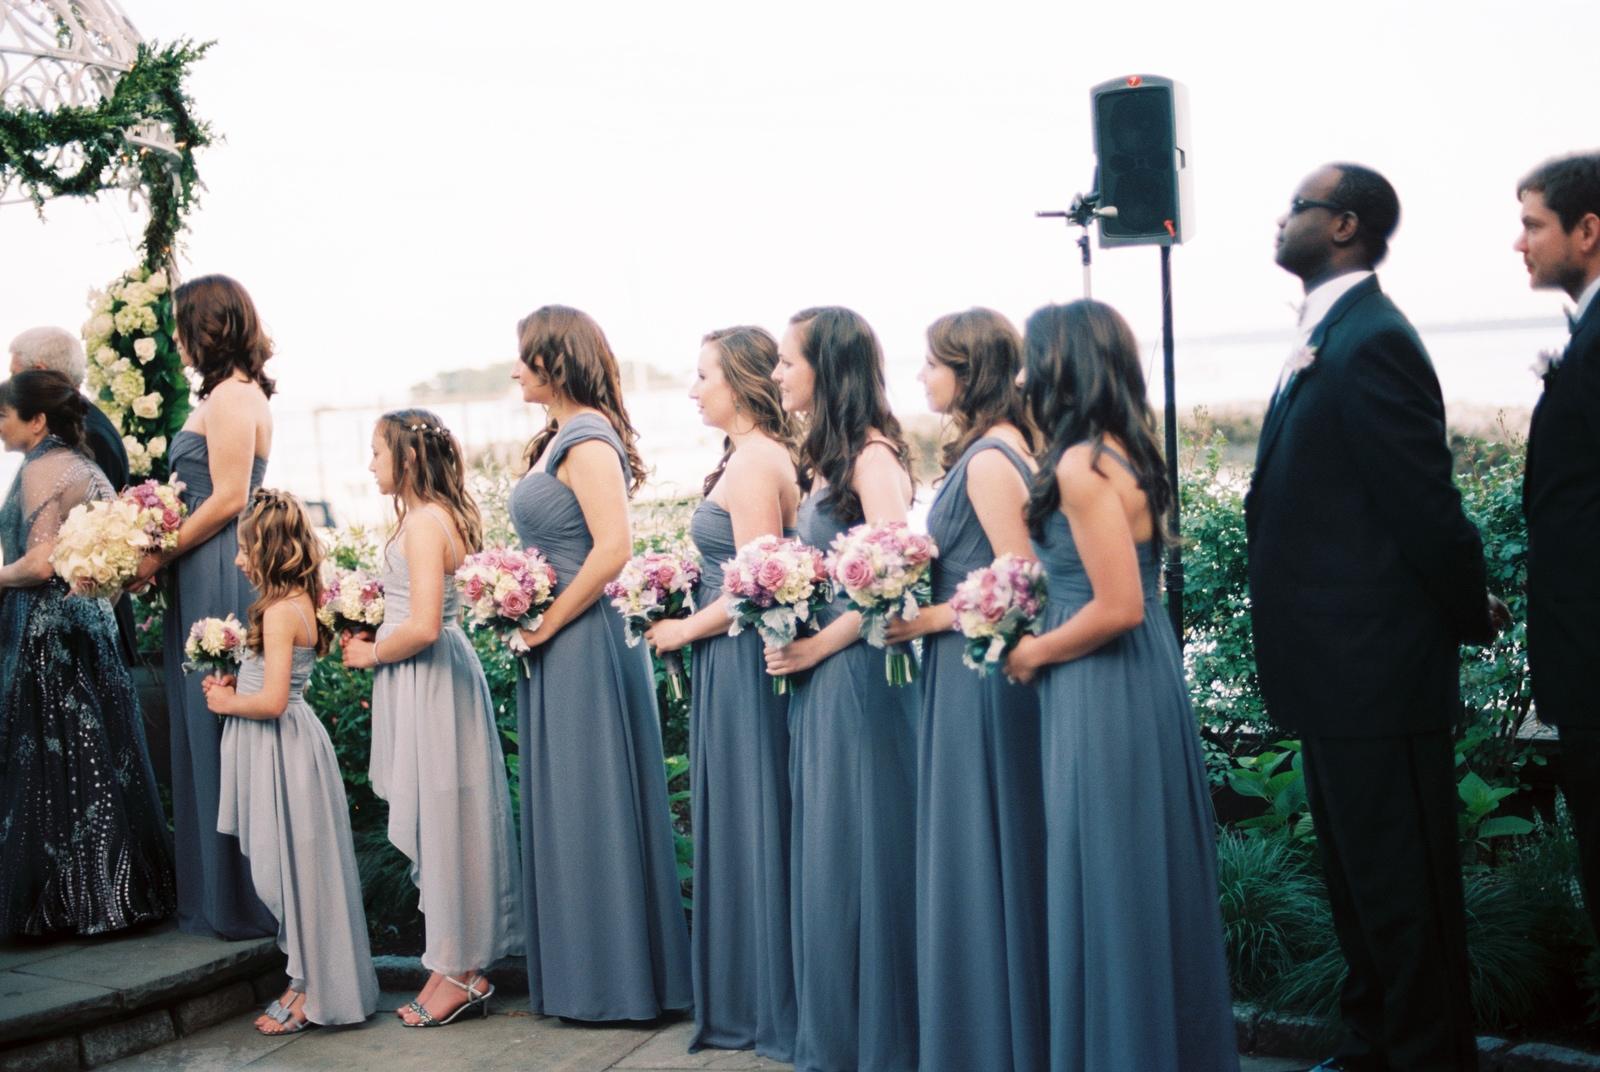 mamaroneck beach yacht club wedding ceremony by wendy g photography